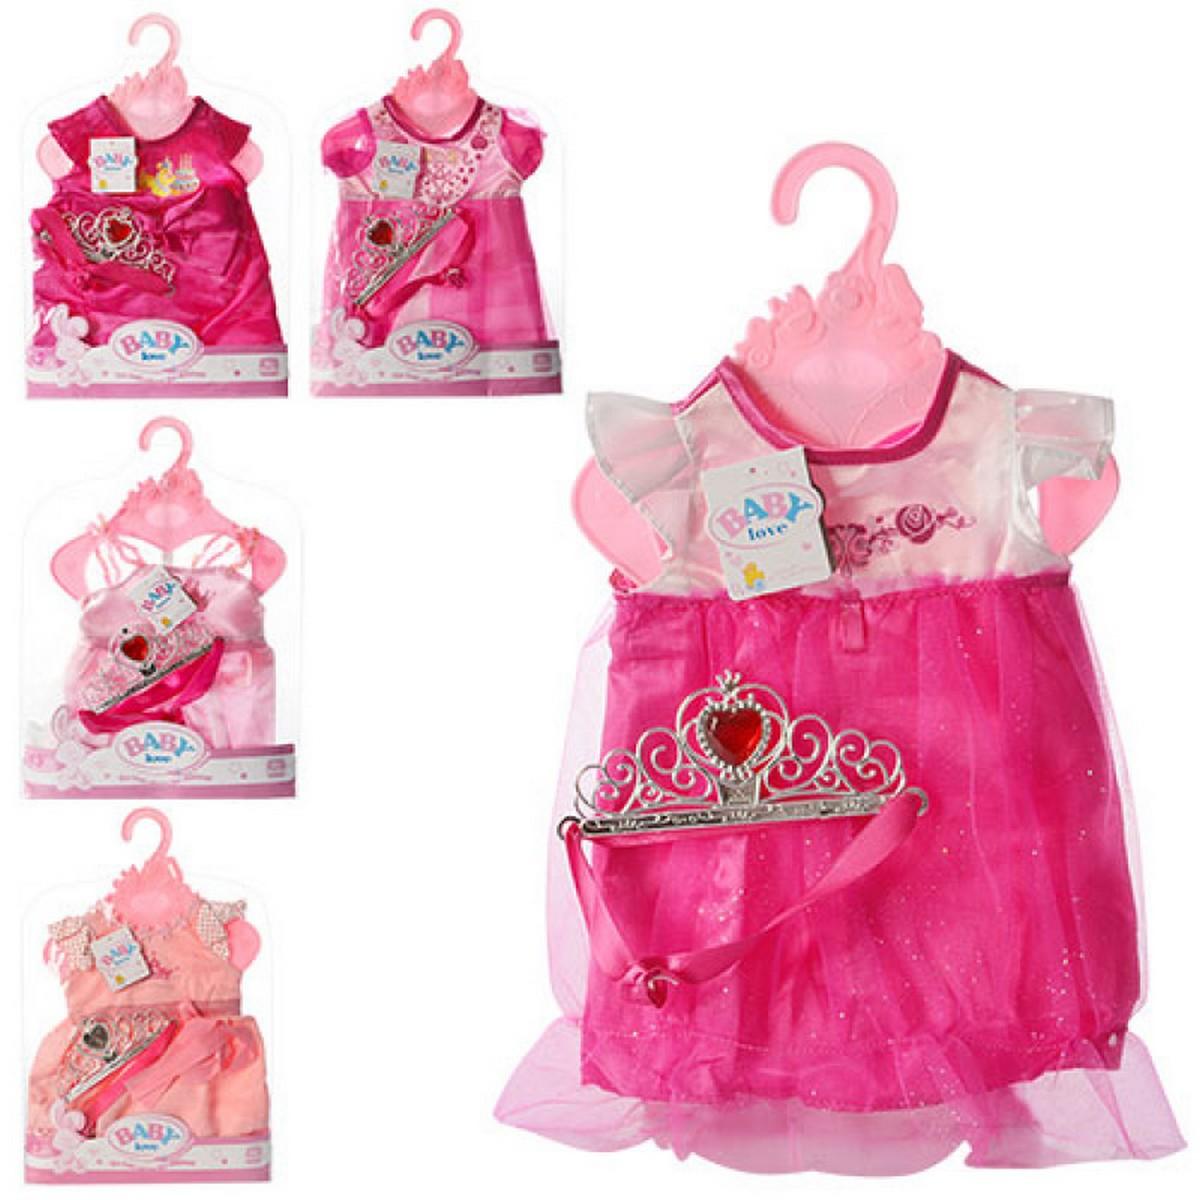 baby doll Кукольный наряд 5 видов BLC18-E-D-C-B-A